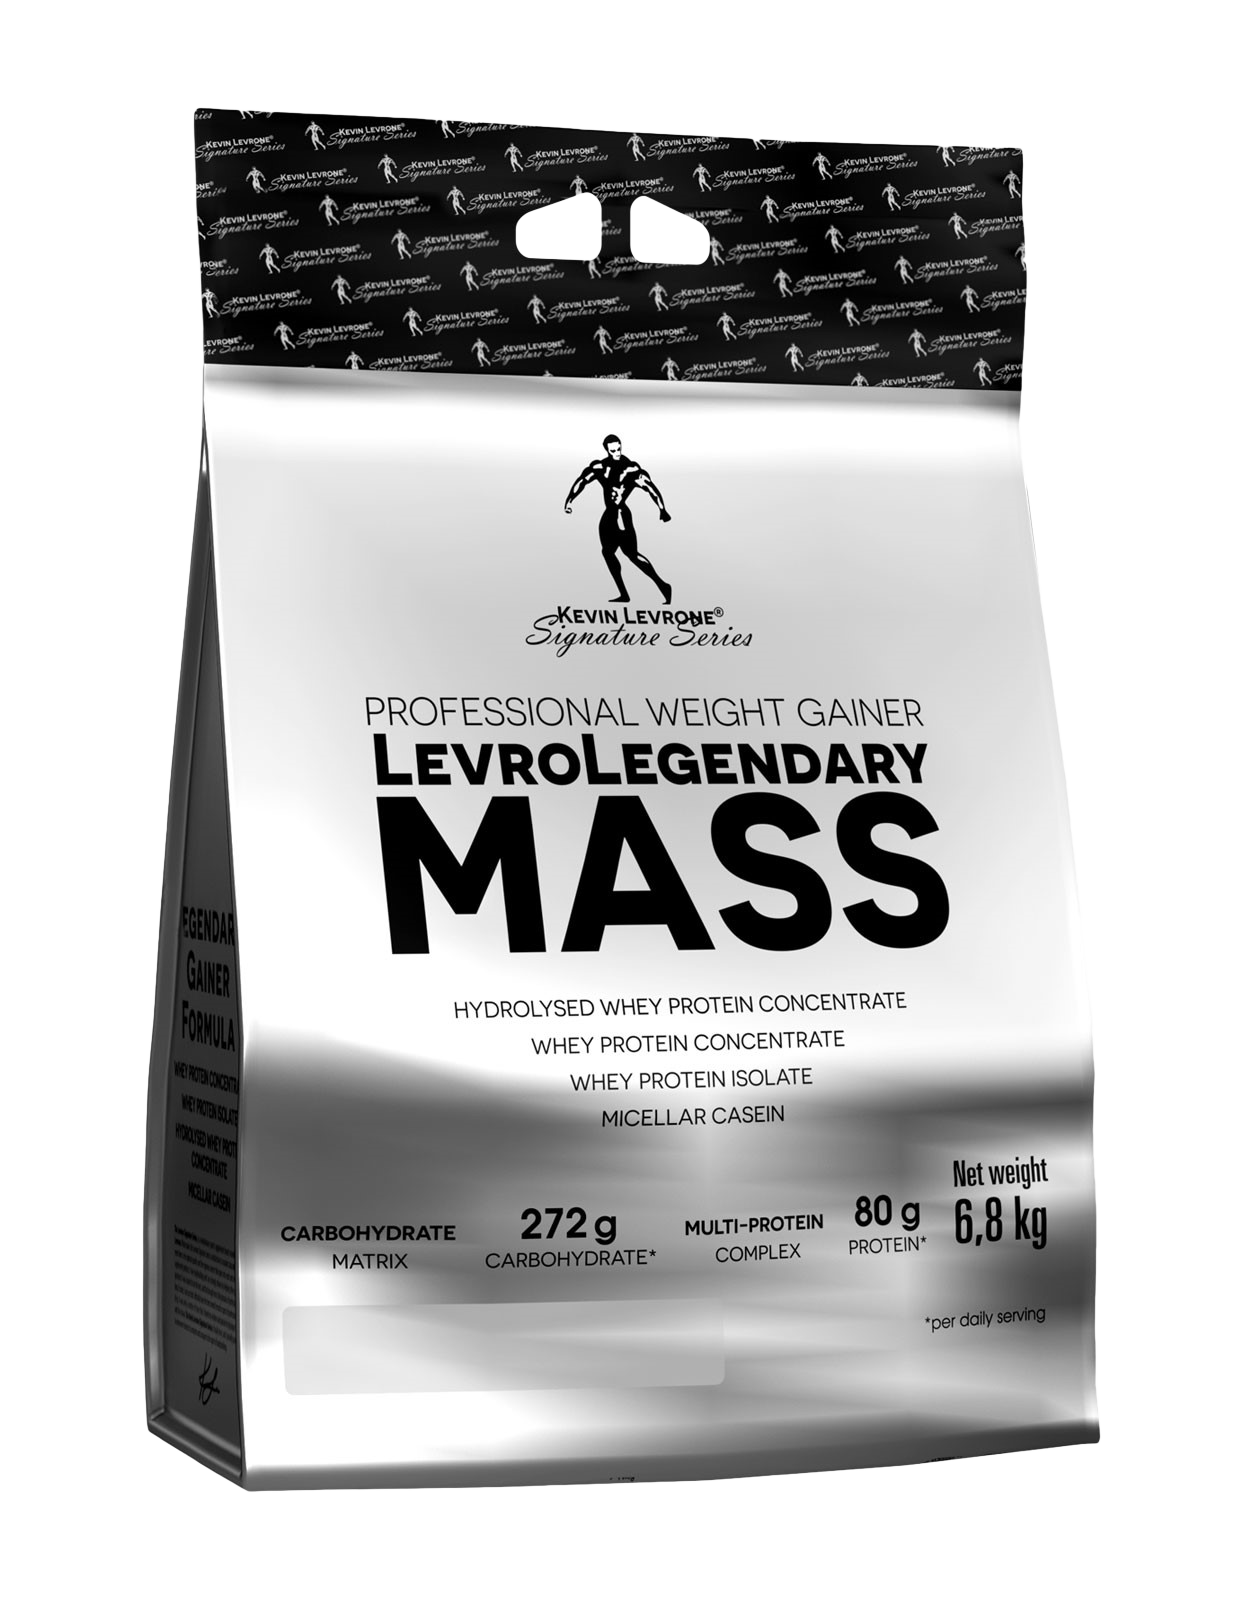 Kevine Levrone Signature Series LevroLegendary MASS 6,8 kg